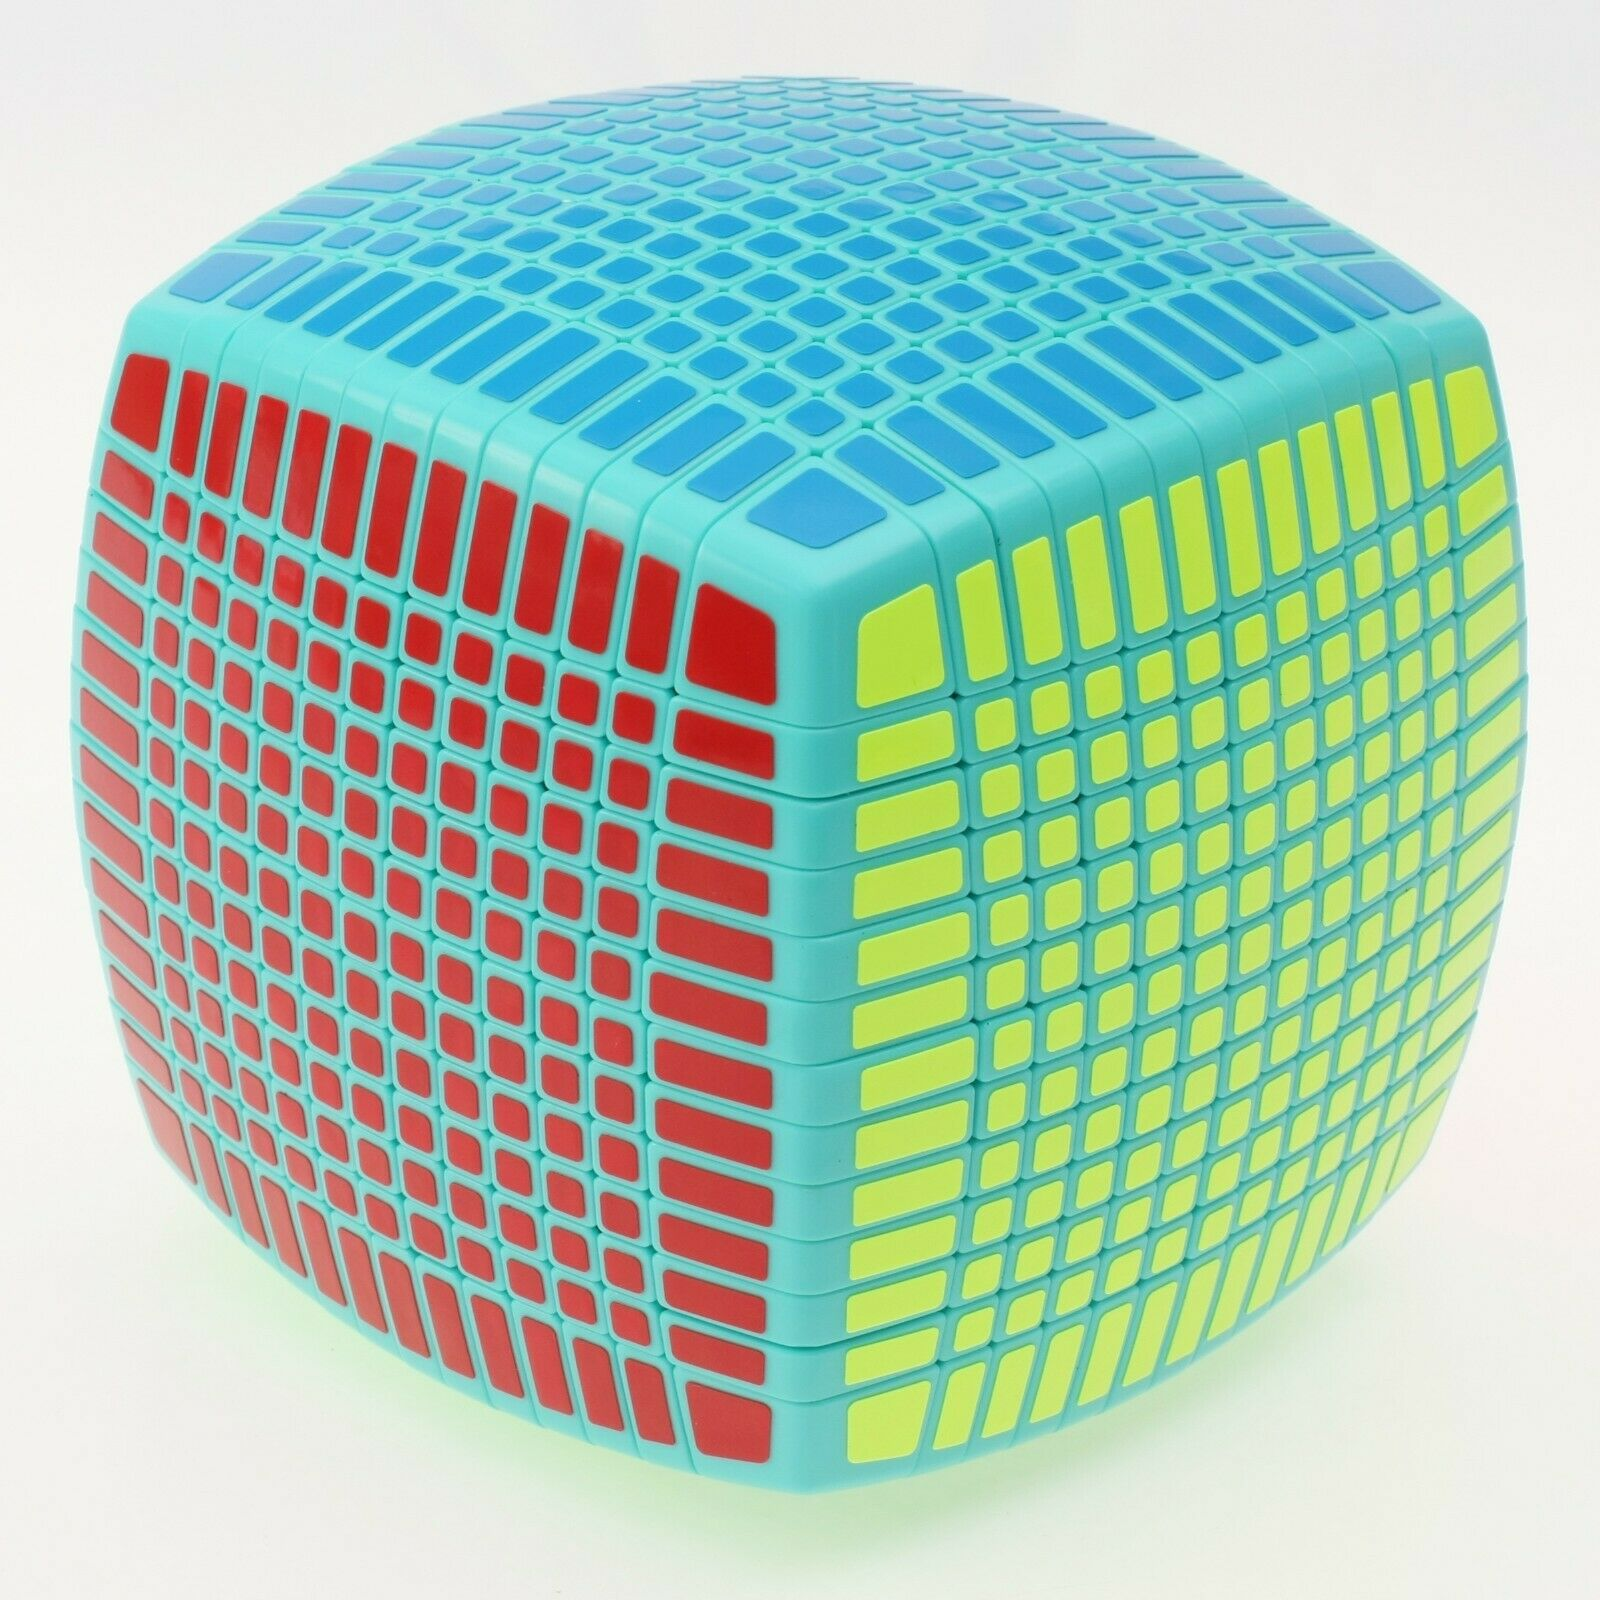 Moyu 13x13x13 Magic  Cube Professional Twisty Puzzle Intelligence Toy vert  promotions d'équipe